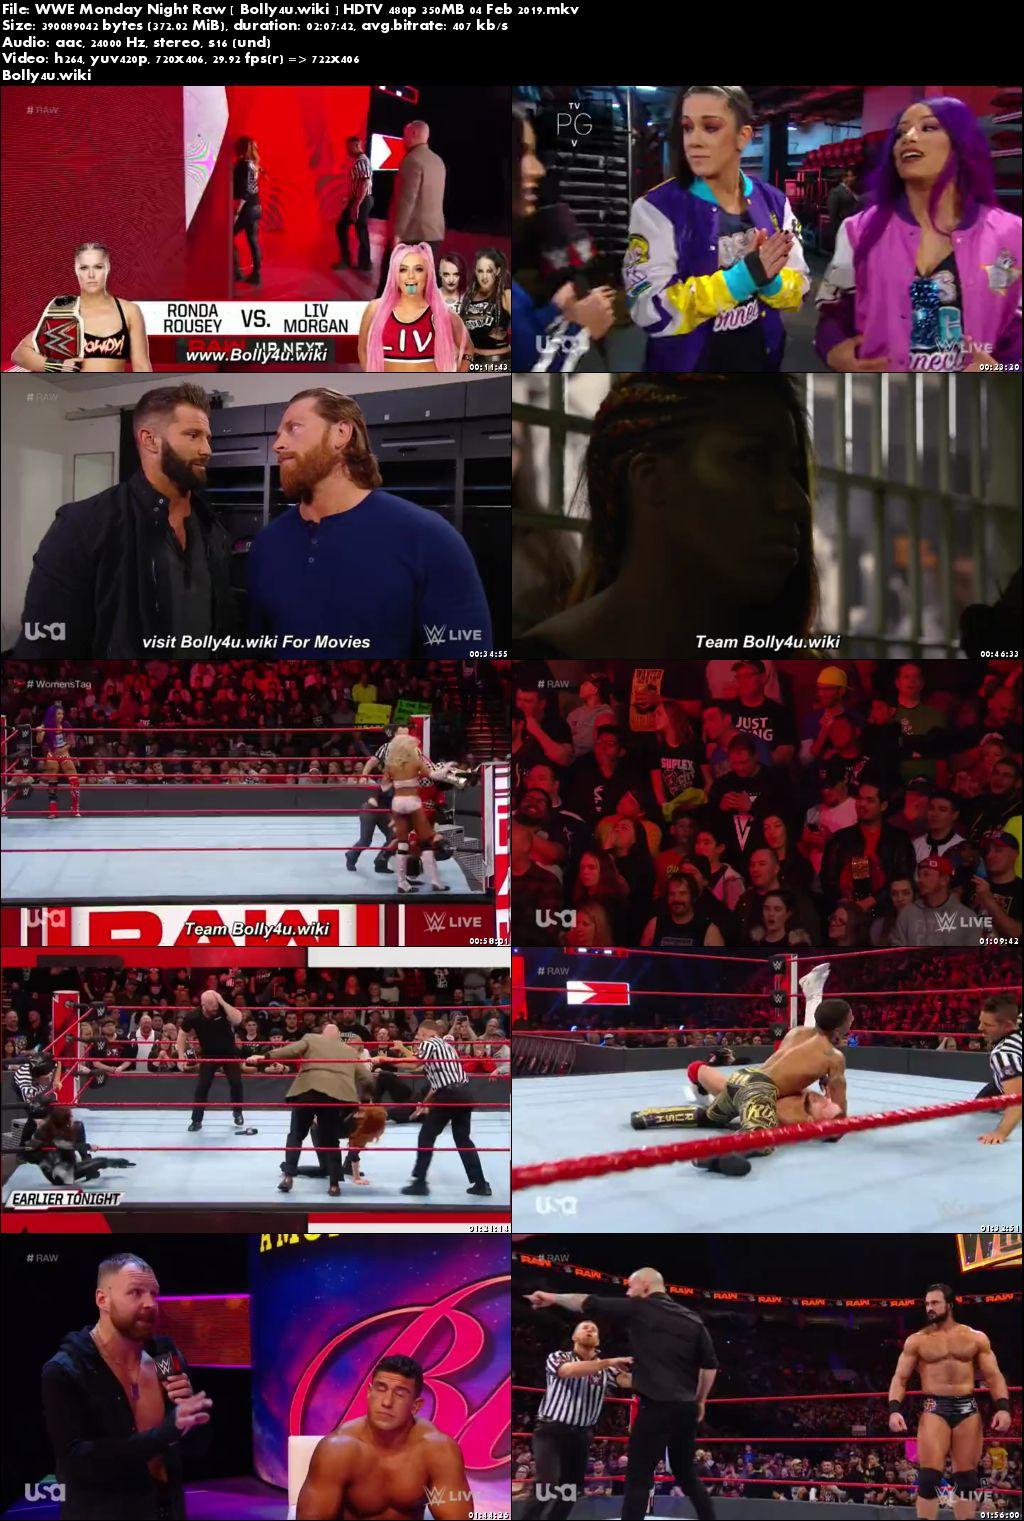 WWE Monday Night Raw HDTV 480p 350MB 04 Feb 2019 Download